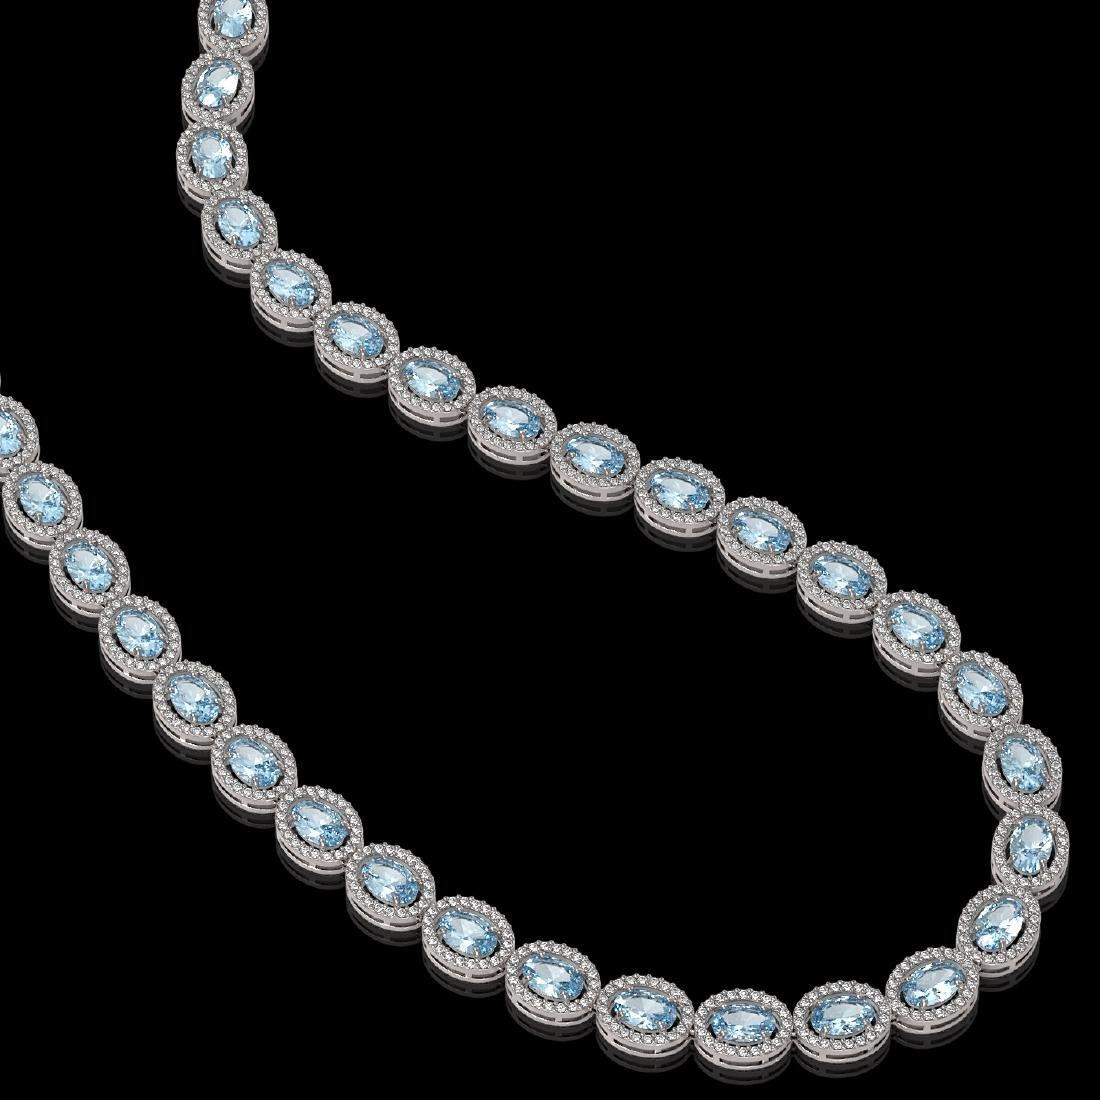 33.25 CTW Sky Topaz & Diamond Halo Necklace 10K White - 2